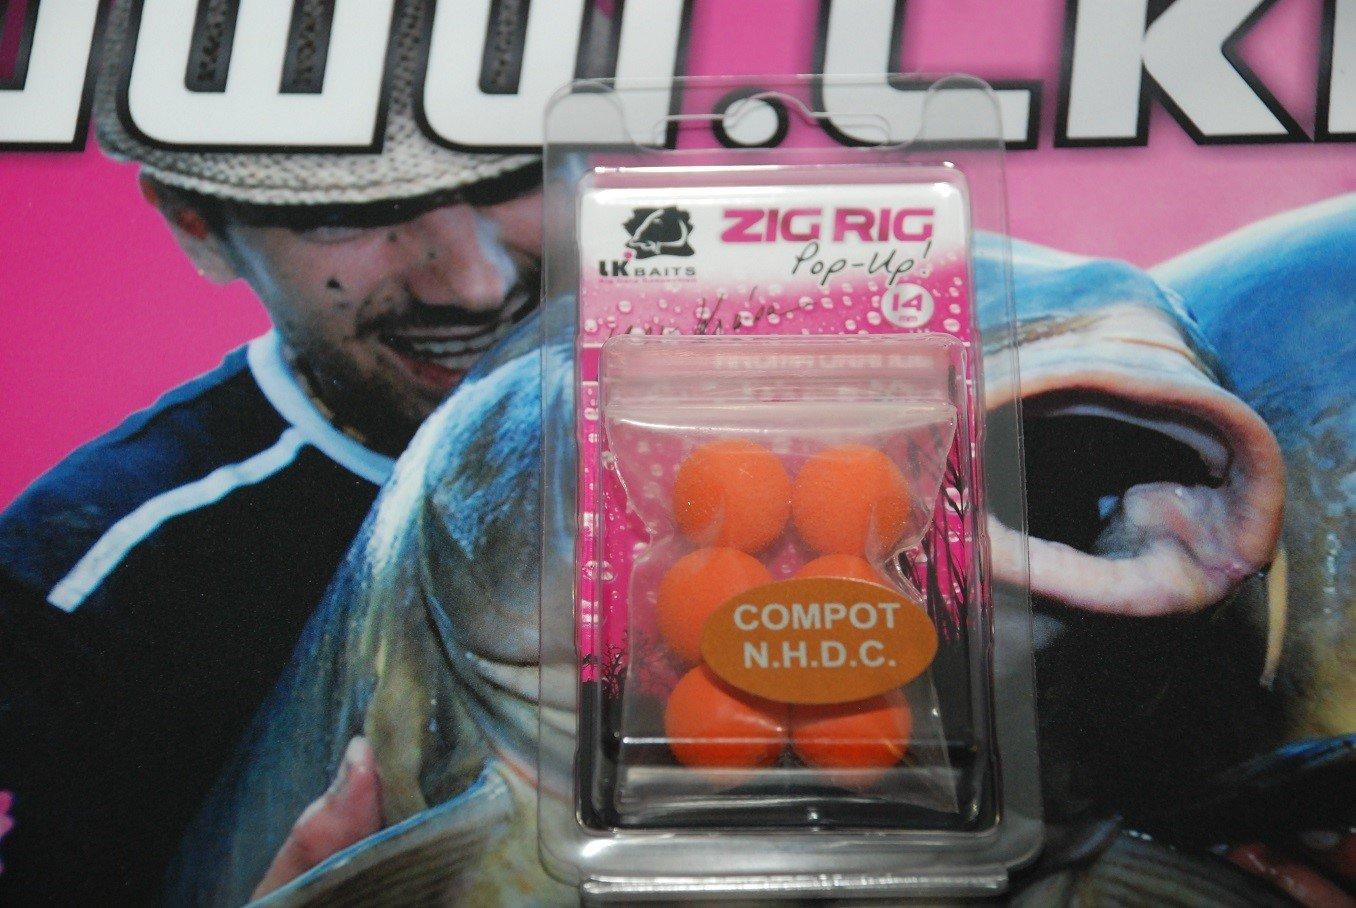 LK Baits ZIG RIG Pop–Up 14 mm – Compot NHDC